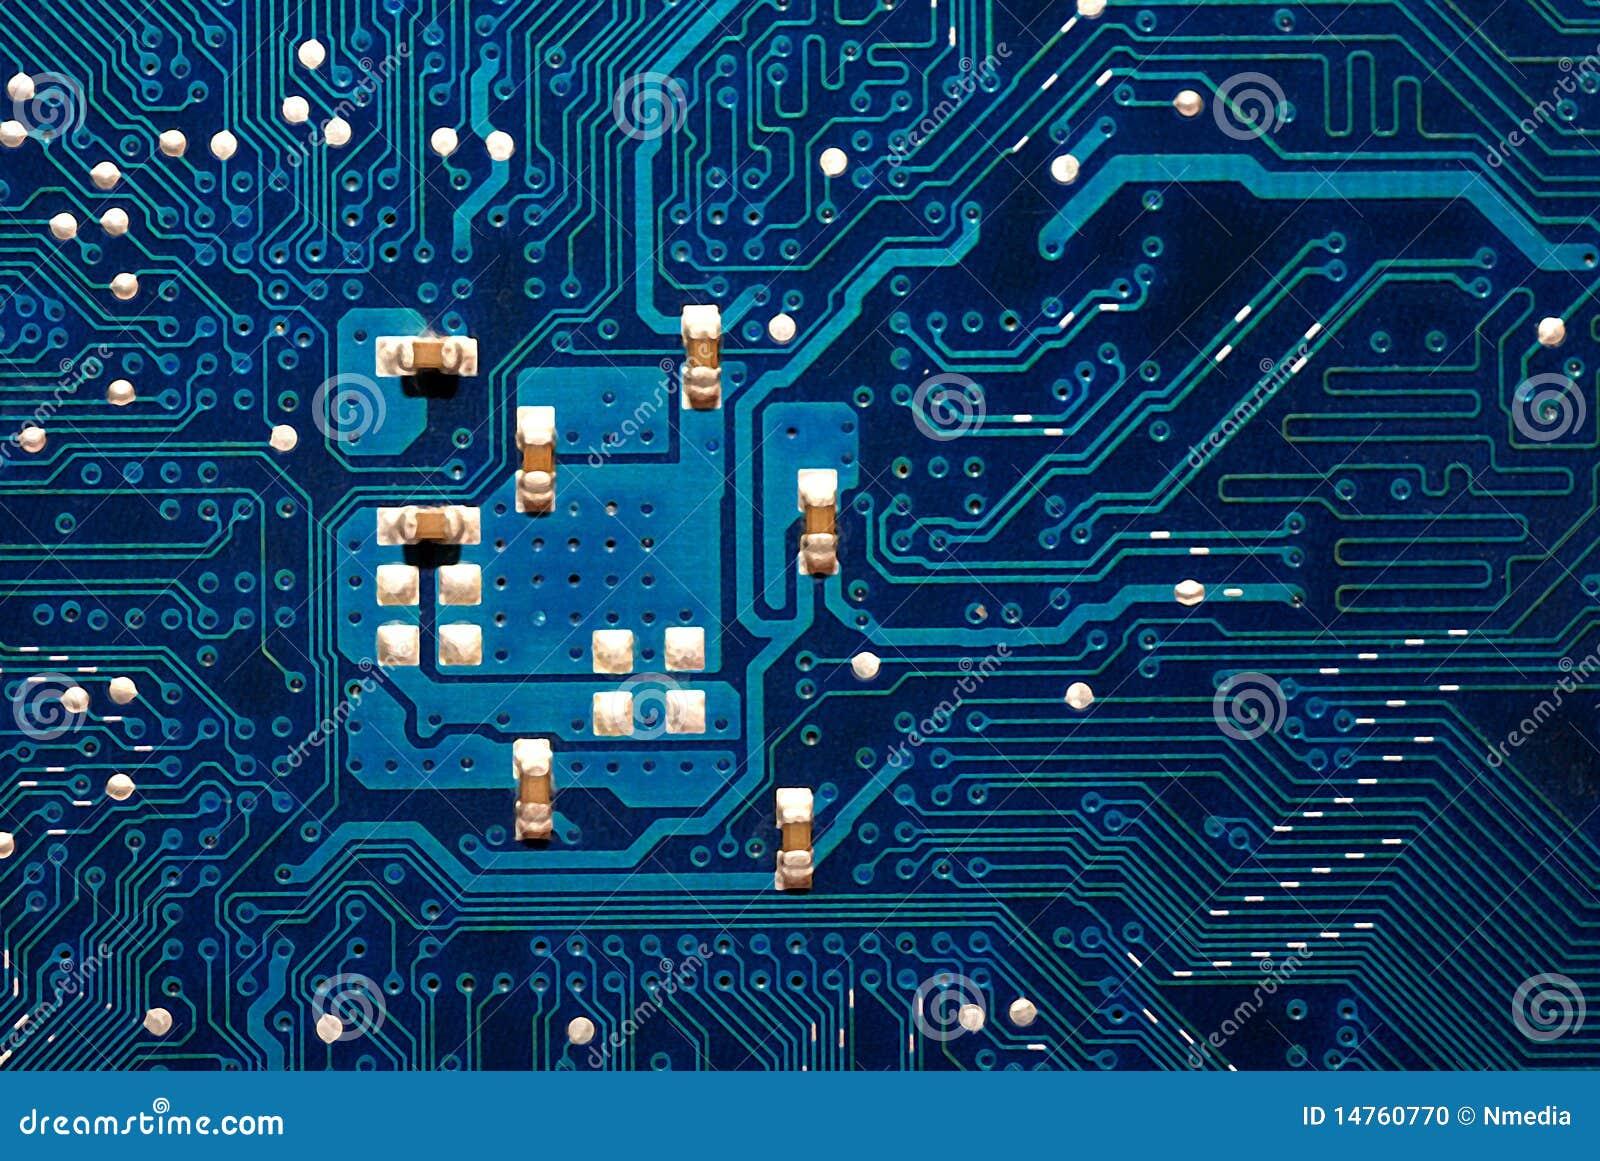 tech background 03 stock photo